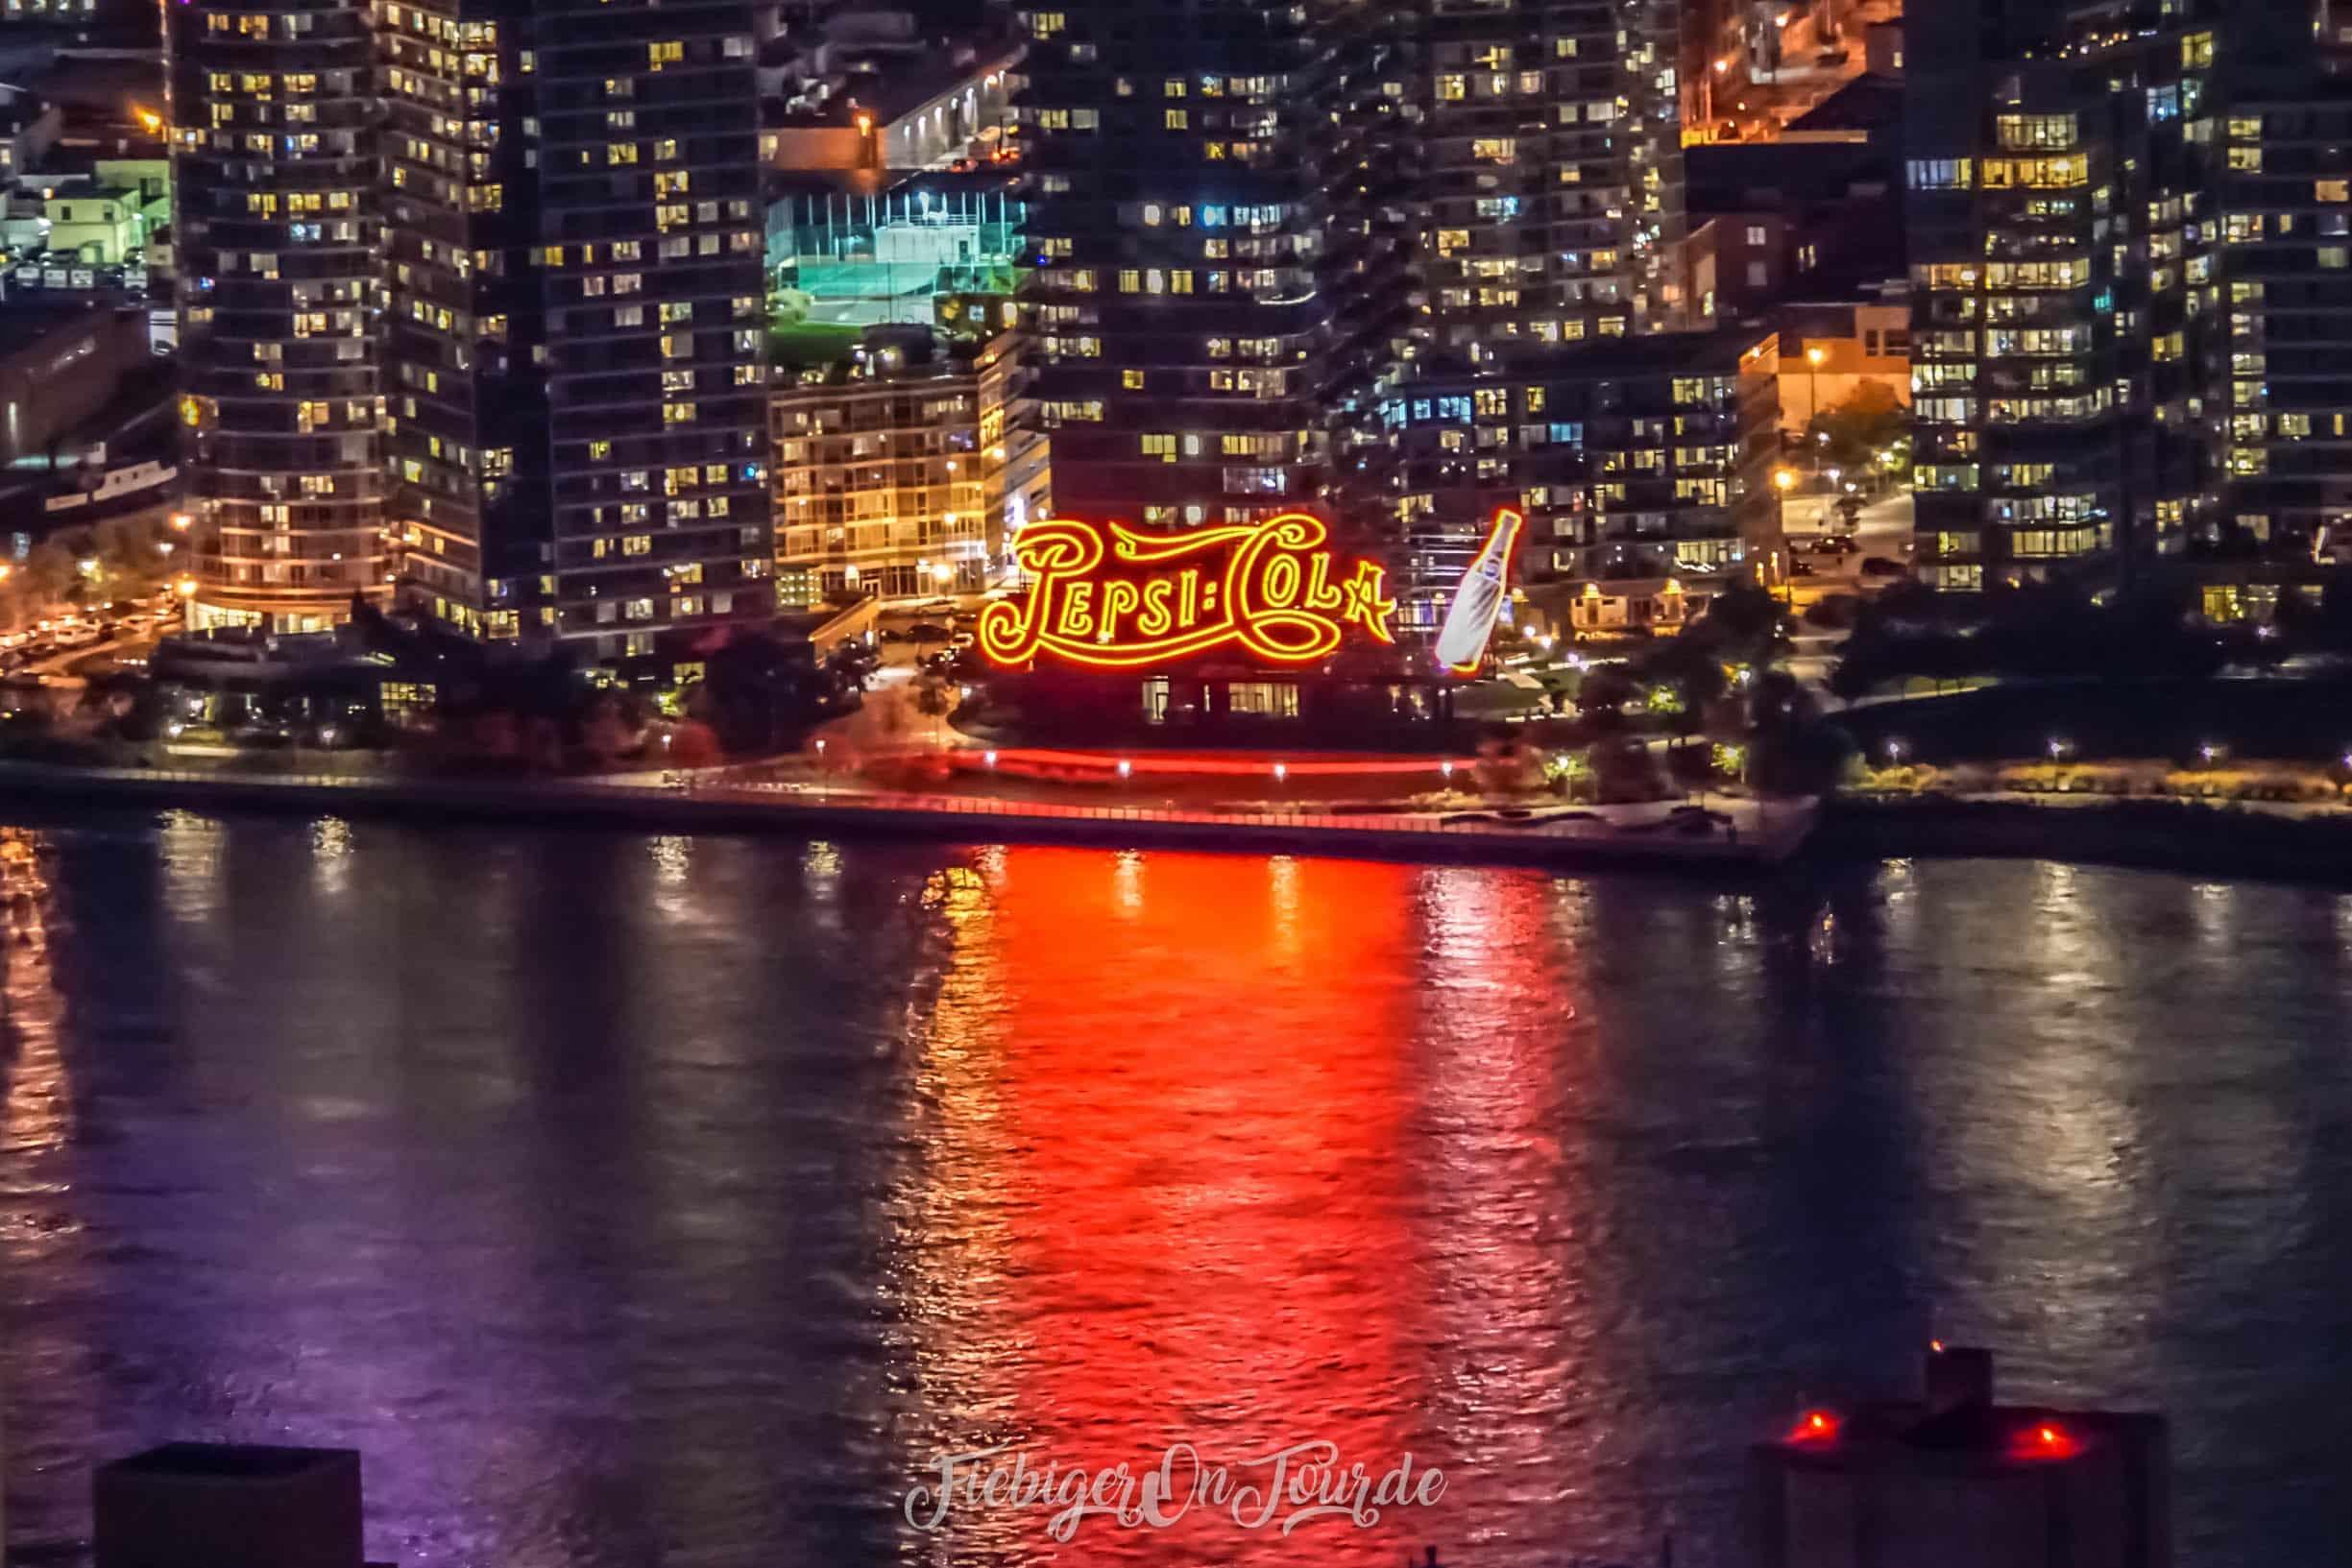 New York Pepsi Cola Night